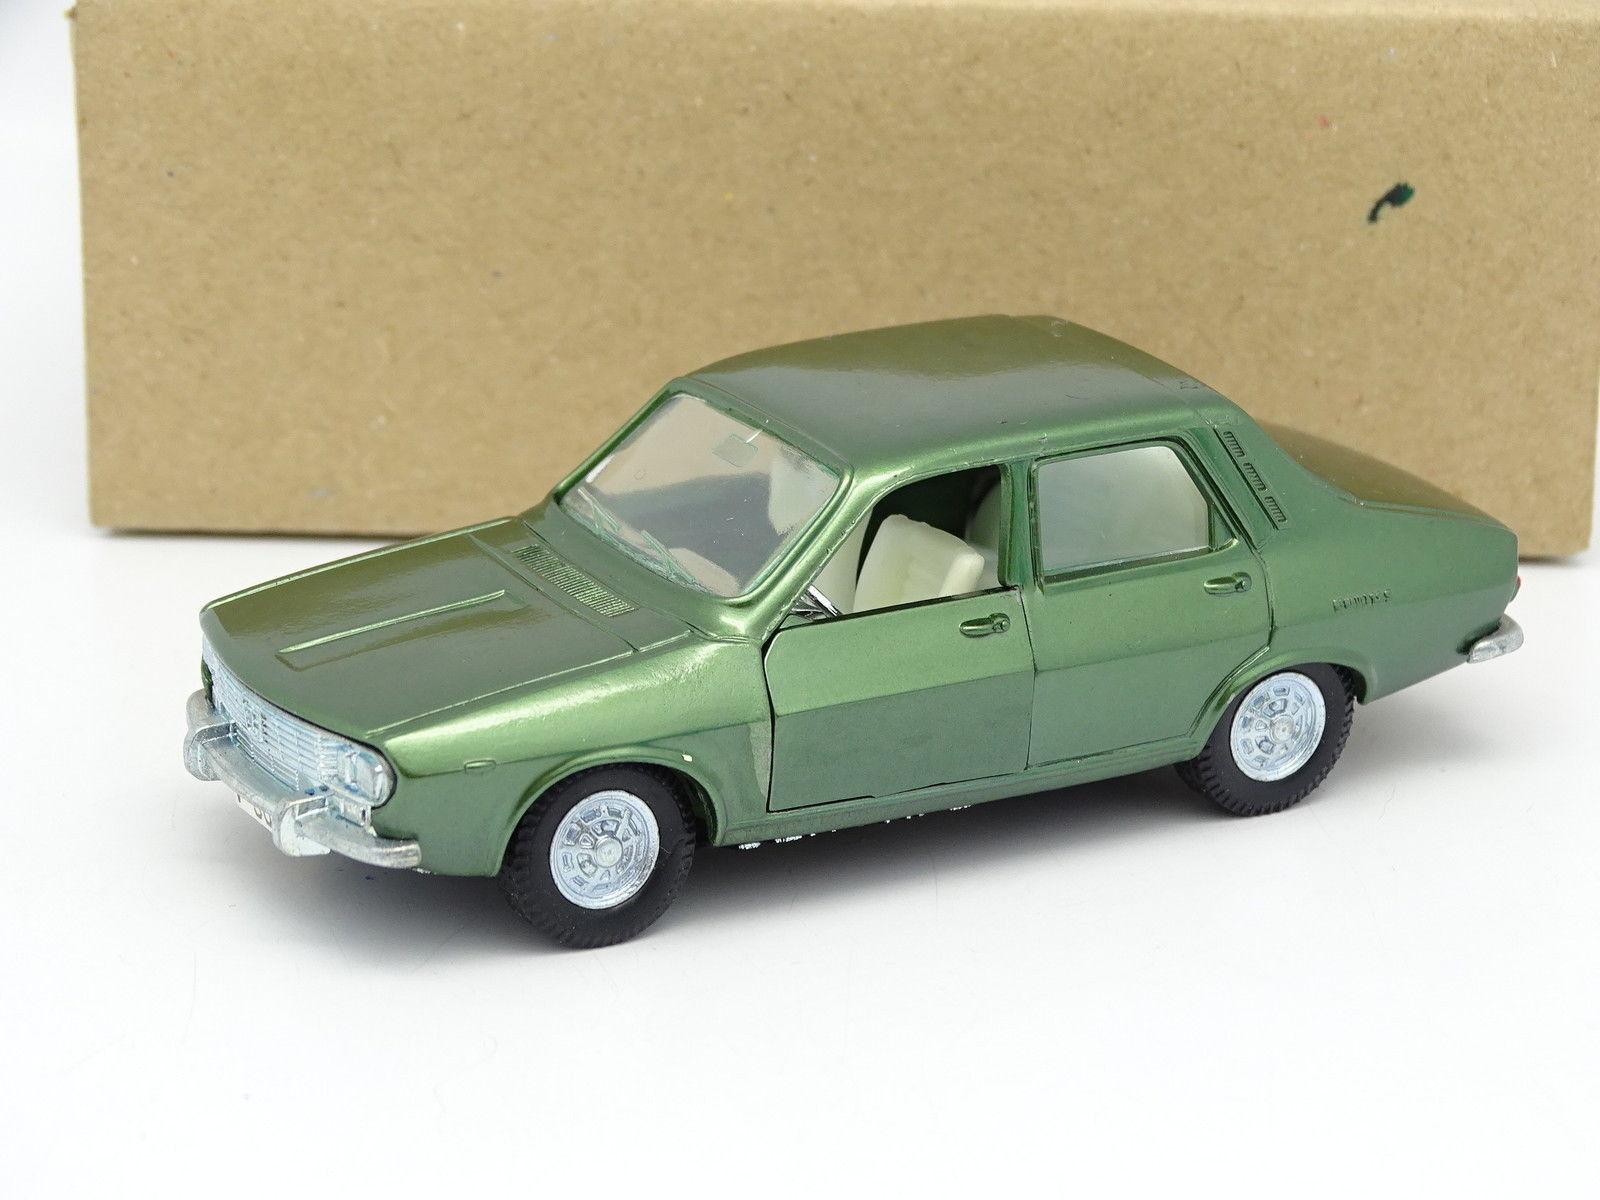 Pilen 1 43 - - - Renault 12 greene 9581b3